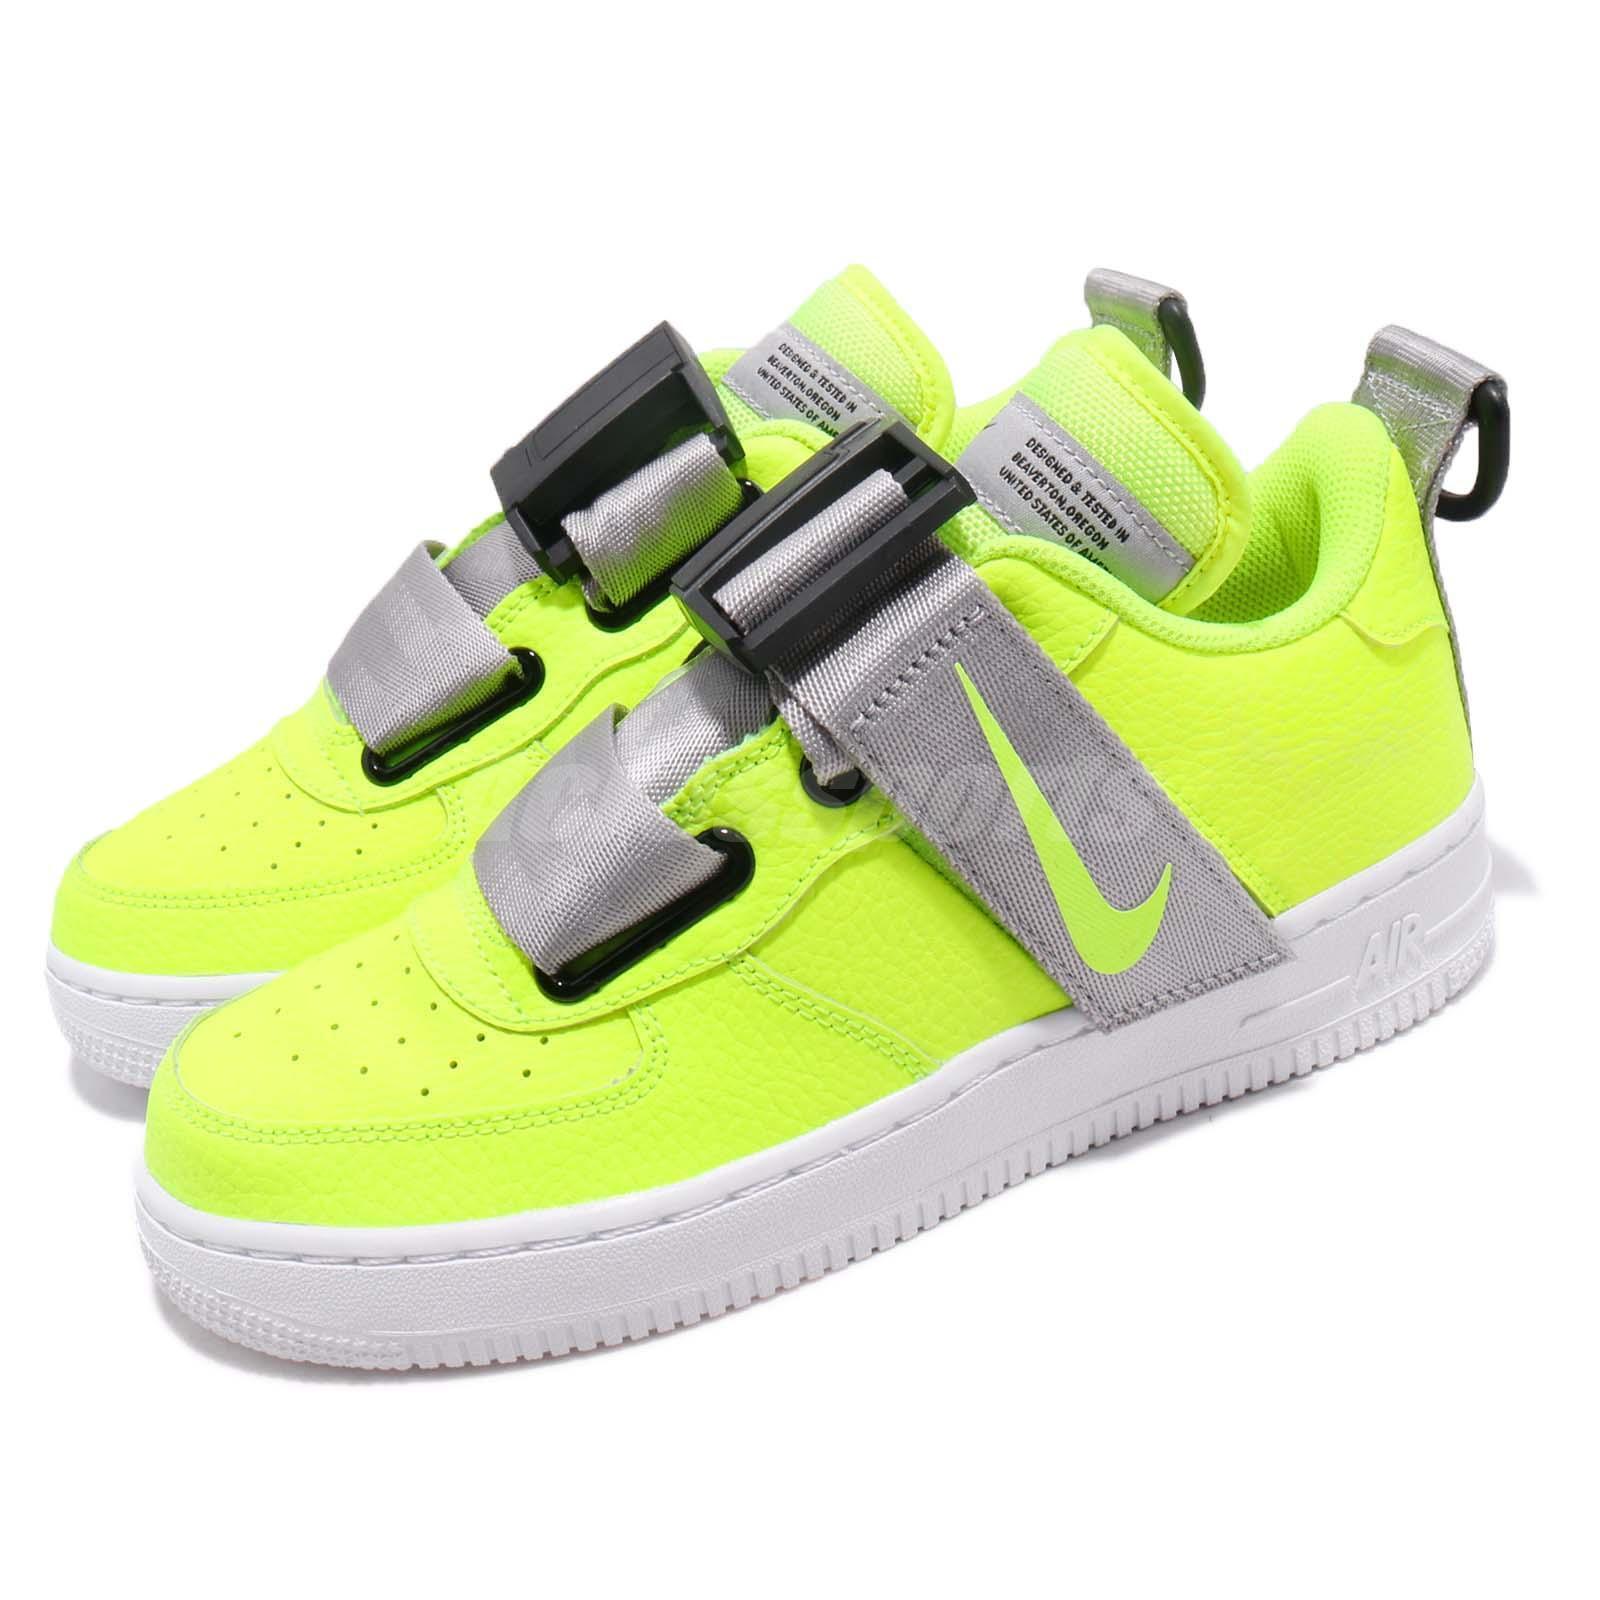 Nike Air Force 1 Utility Utility Utility GS AF1 Volt Reflect plata Kid Youth mujer AJ6601-700  están haciendo actividades de descuento